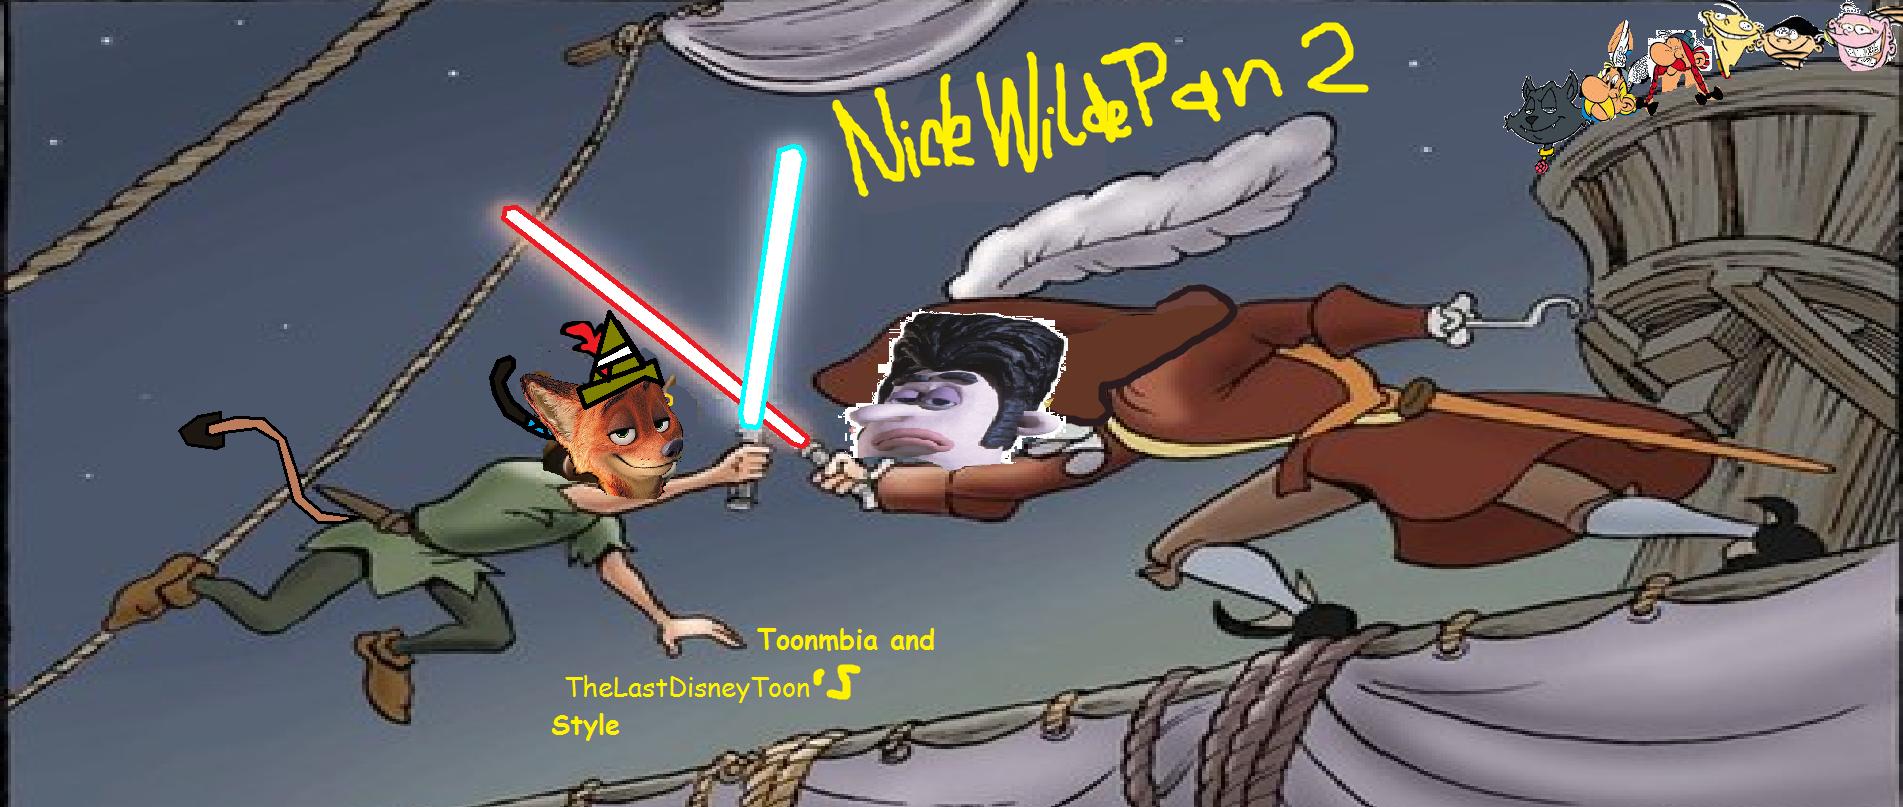 Nick Wilde Pan 2 (TheLastDisneyToon and Toonmbia Style)